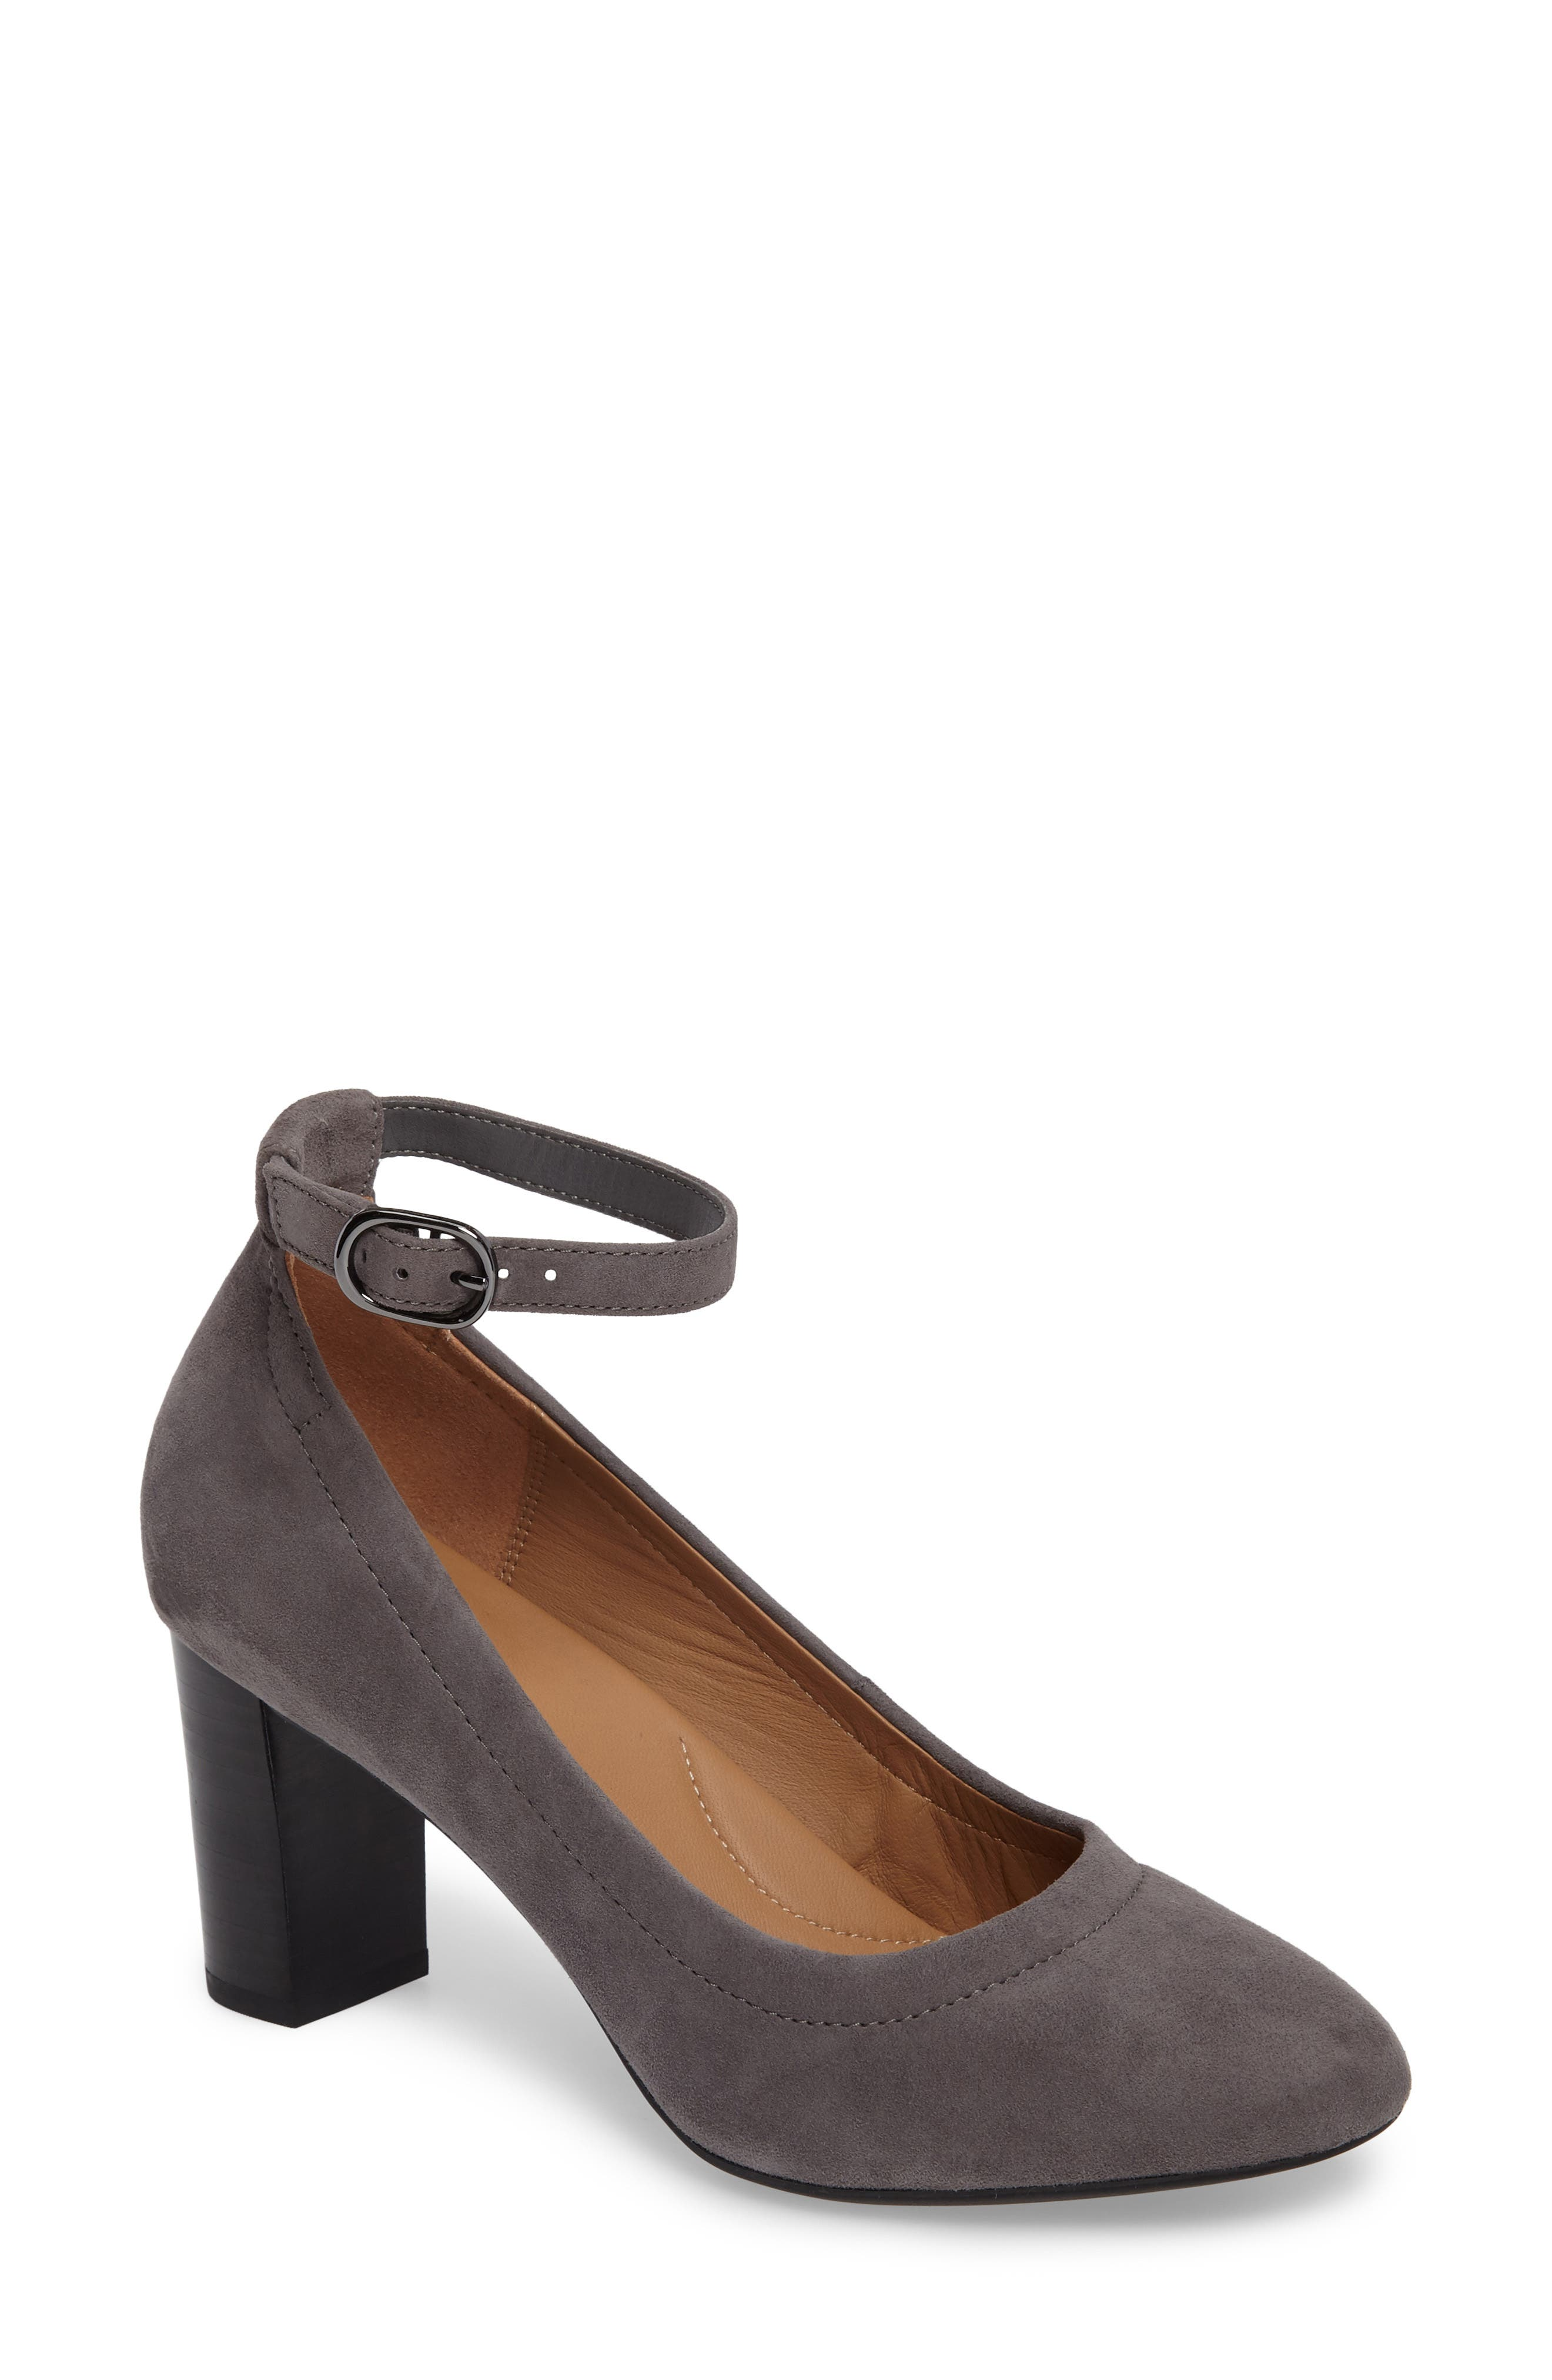 Alternate Image 1 Selected - Clarks® Chryssa Jana Ankle Strap Pump (Women)